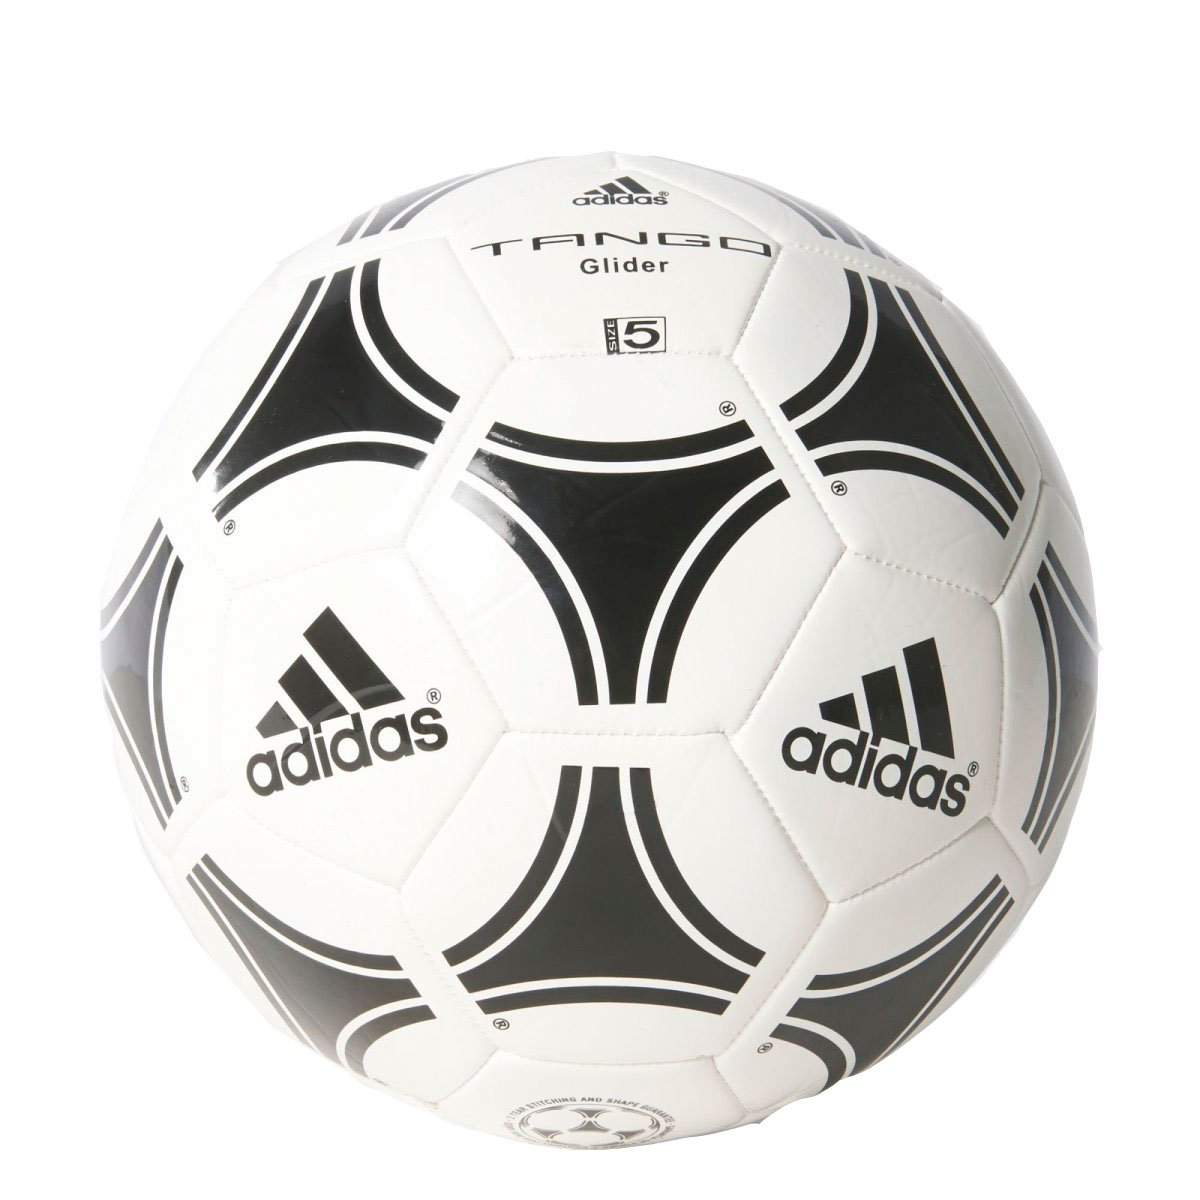 822b1f360330d Bizz Store - Bola Futebol De Campo Adidas Tango Glider